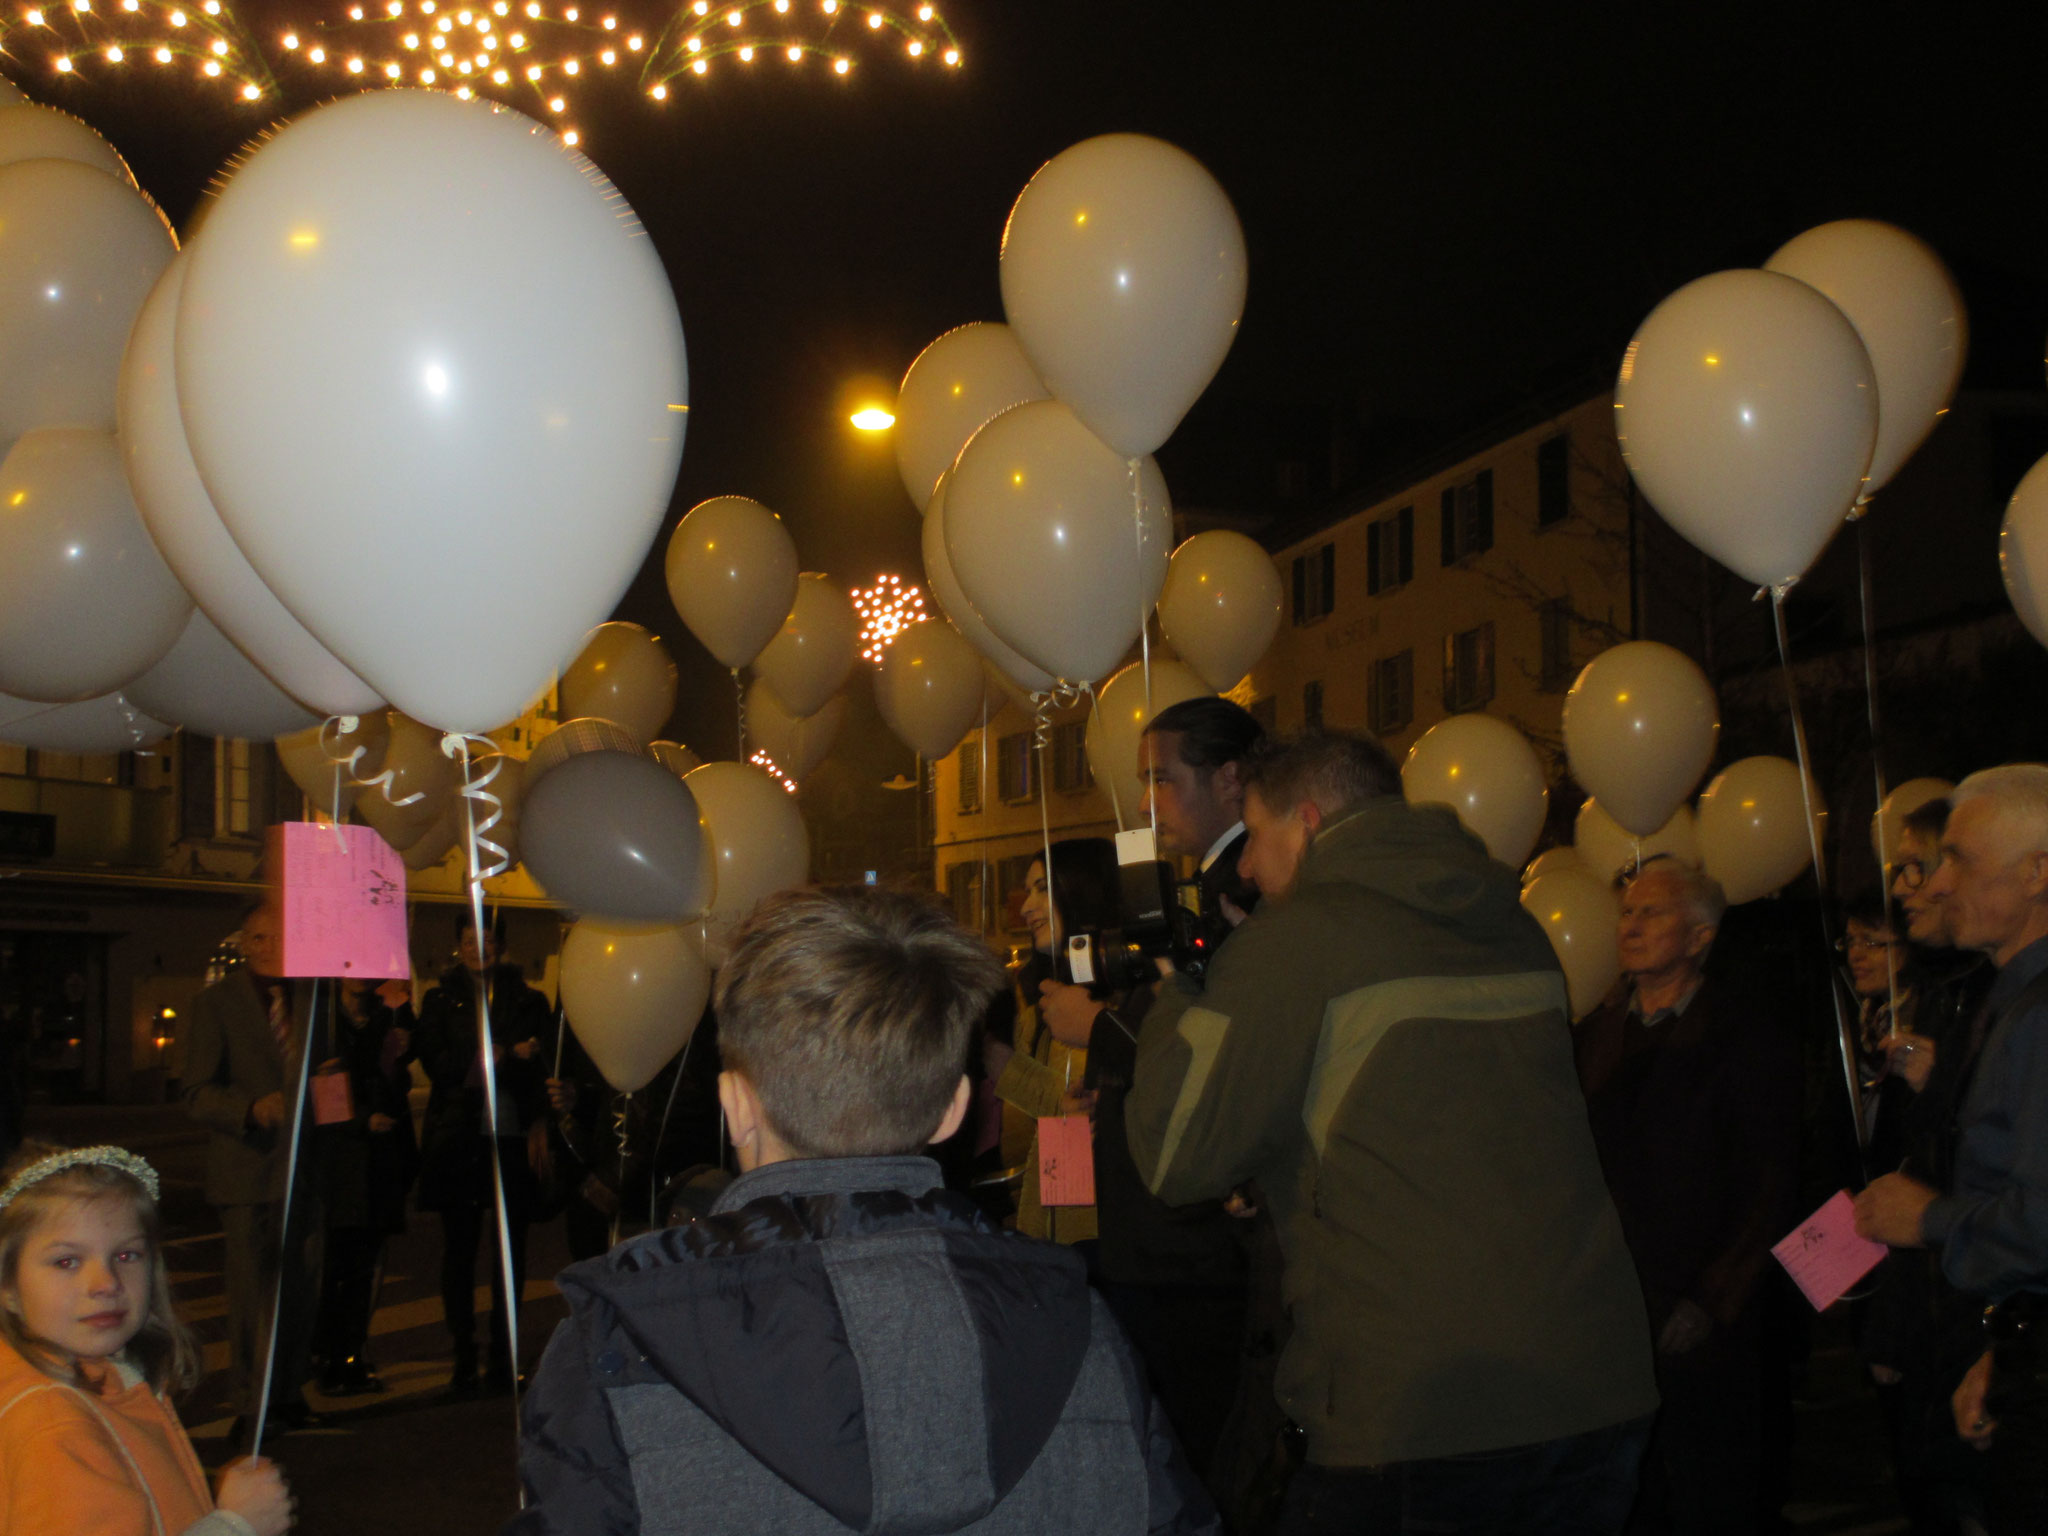 Nacht - Ballonstart mit Wunderkerzen